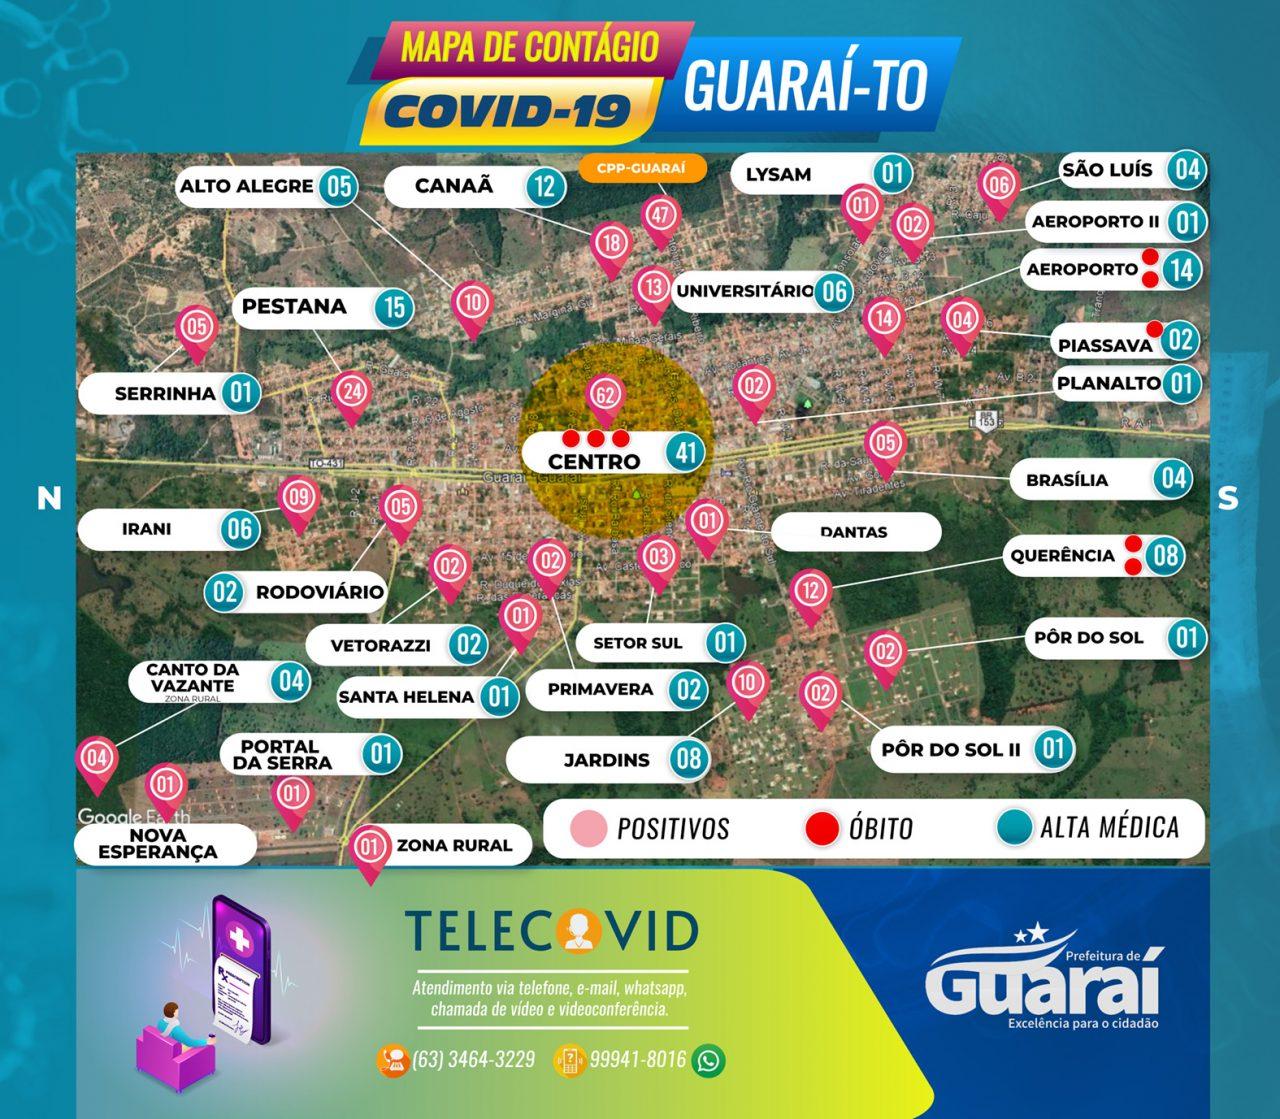 MAPA GUARAI COVID19 QUARTA 8 DE JULHO 1280x1119 - PaineI Guaraí-TO / Covid-19 / Boletim 08 de Julho (Quarta) 16:00